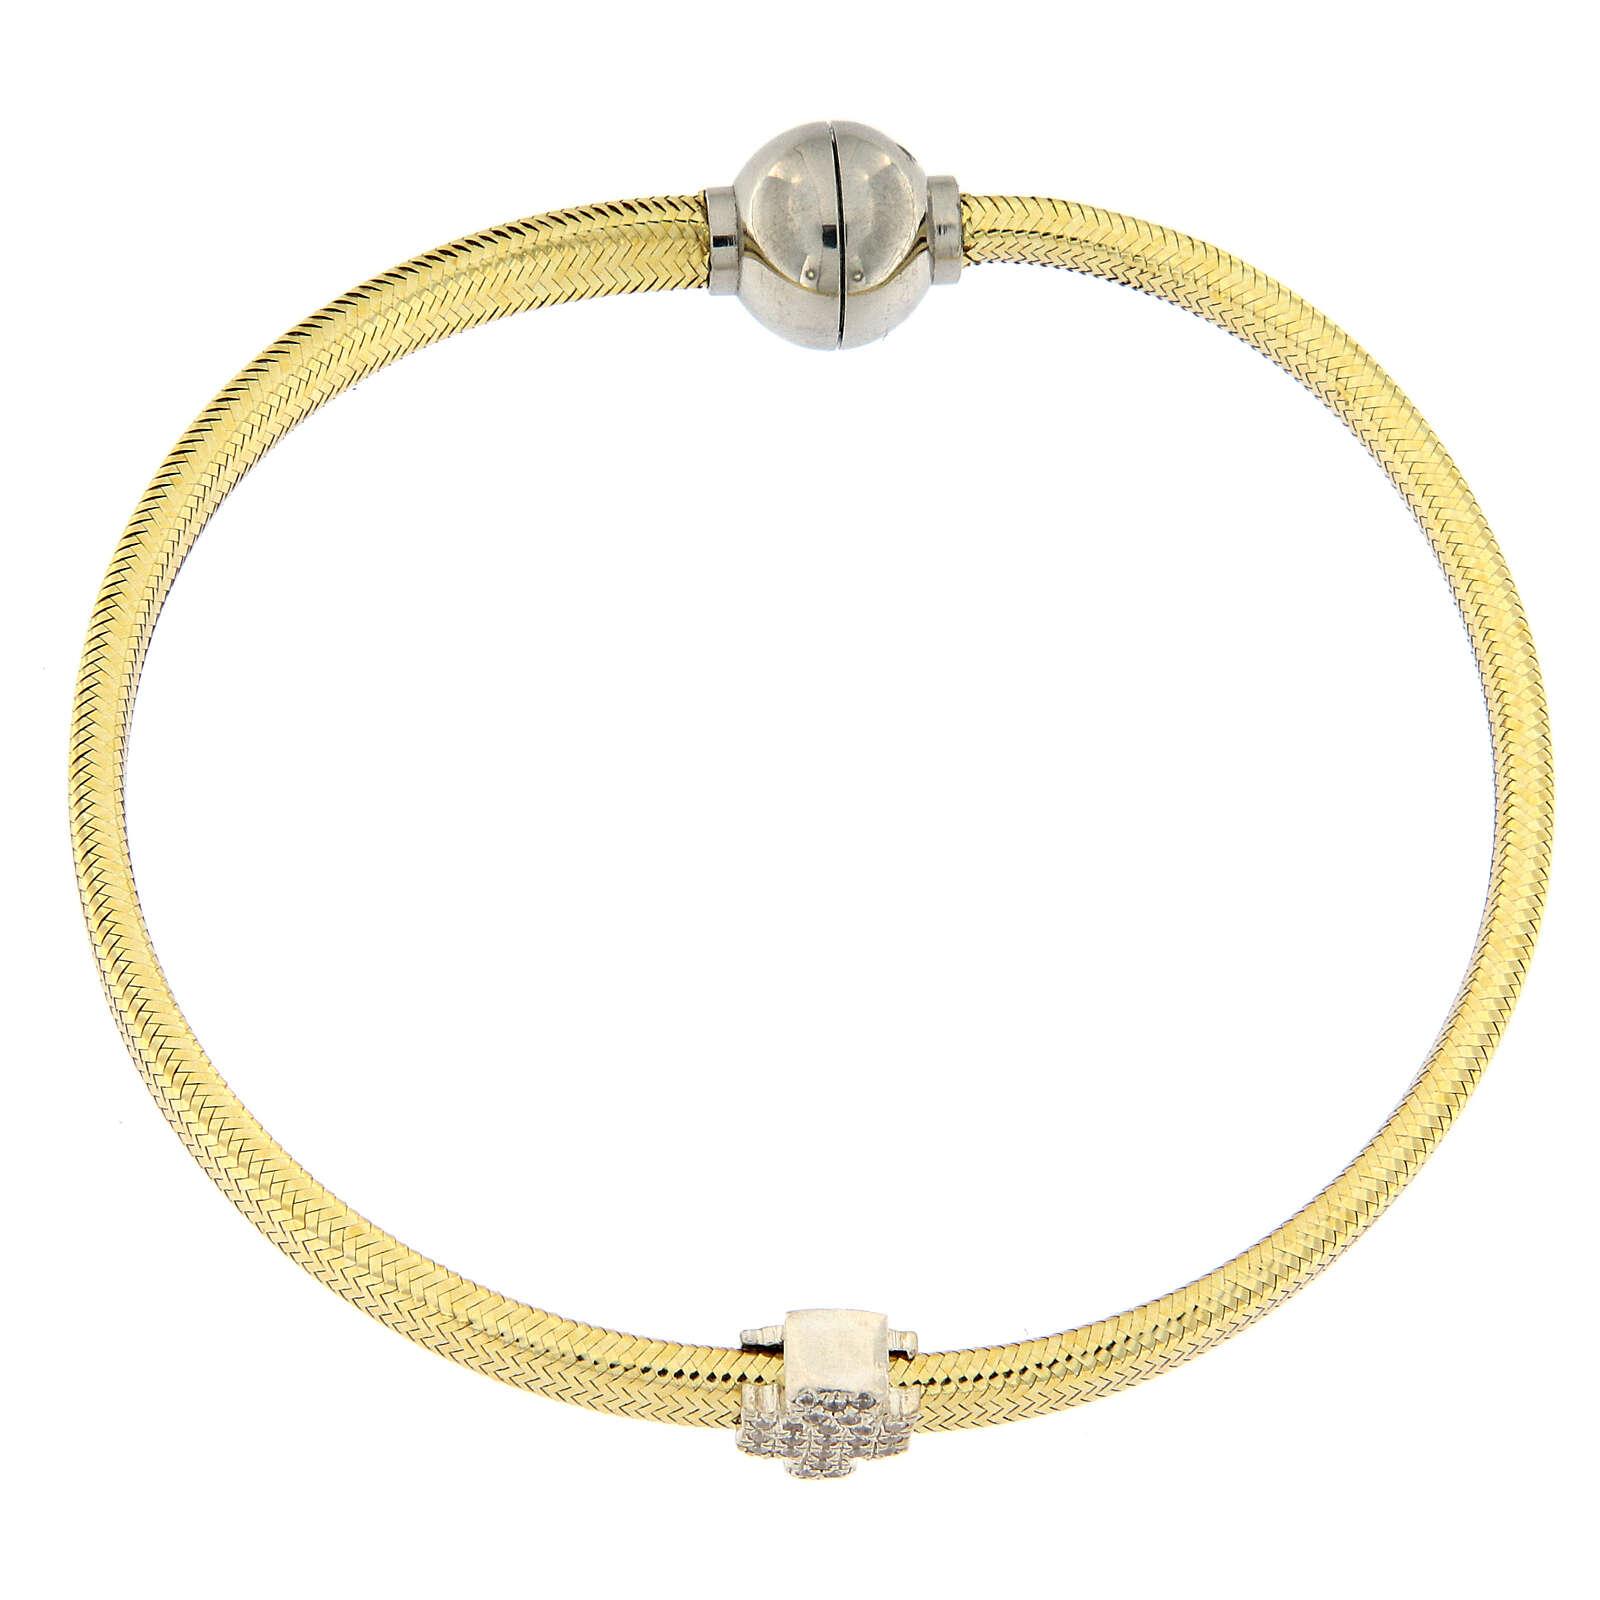 Bracciale lurex oro angelo argento 925 AMEN 4